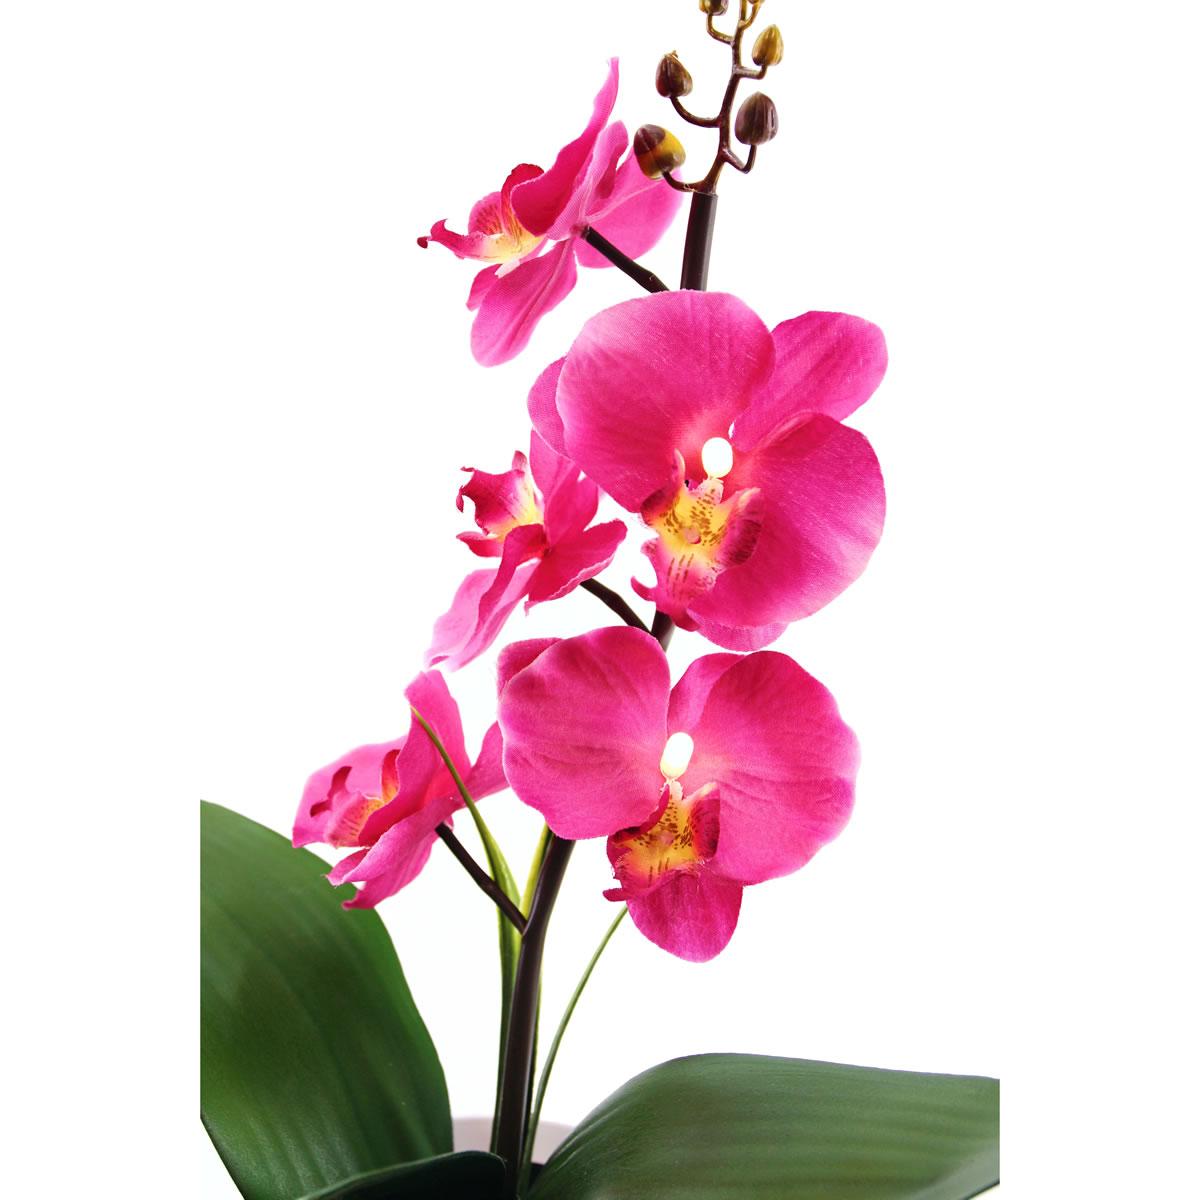 art decor LED Orchidee im Blumentopf, Pflanze, Beleuchtung, Blume ...